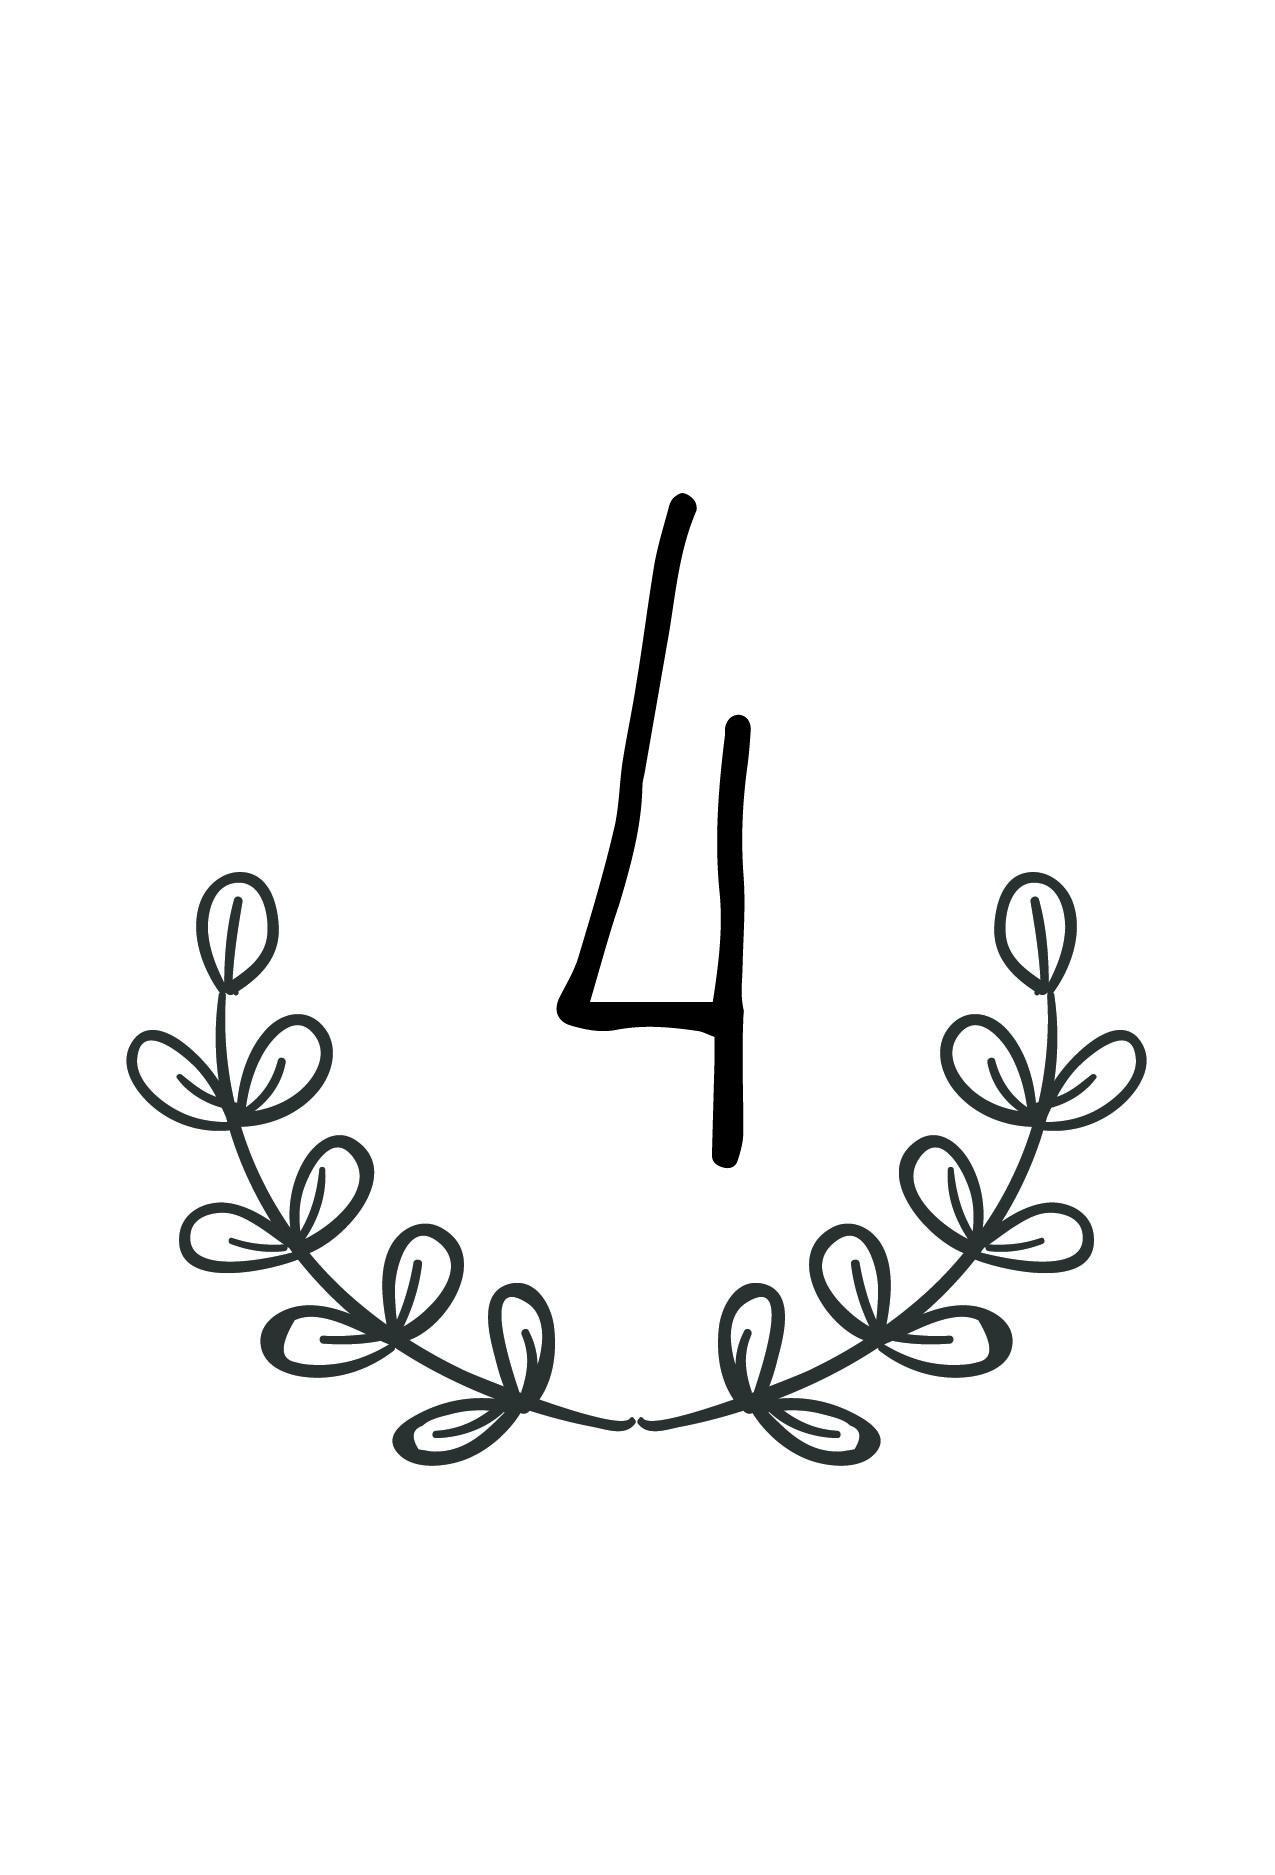 Free Rustic Wedding Table Number Printable | Future Wedding In 2019 - Free Printable Table Numbers